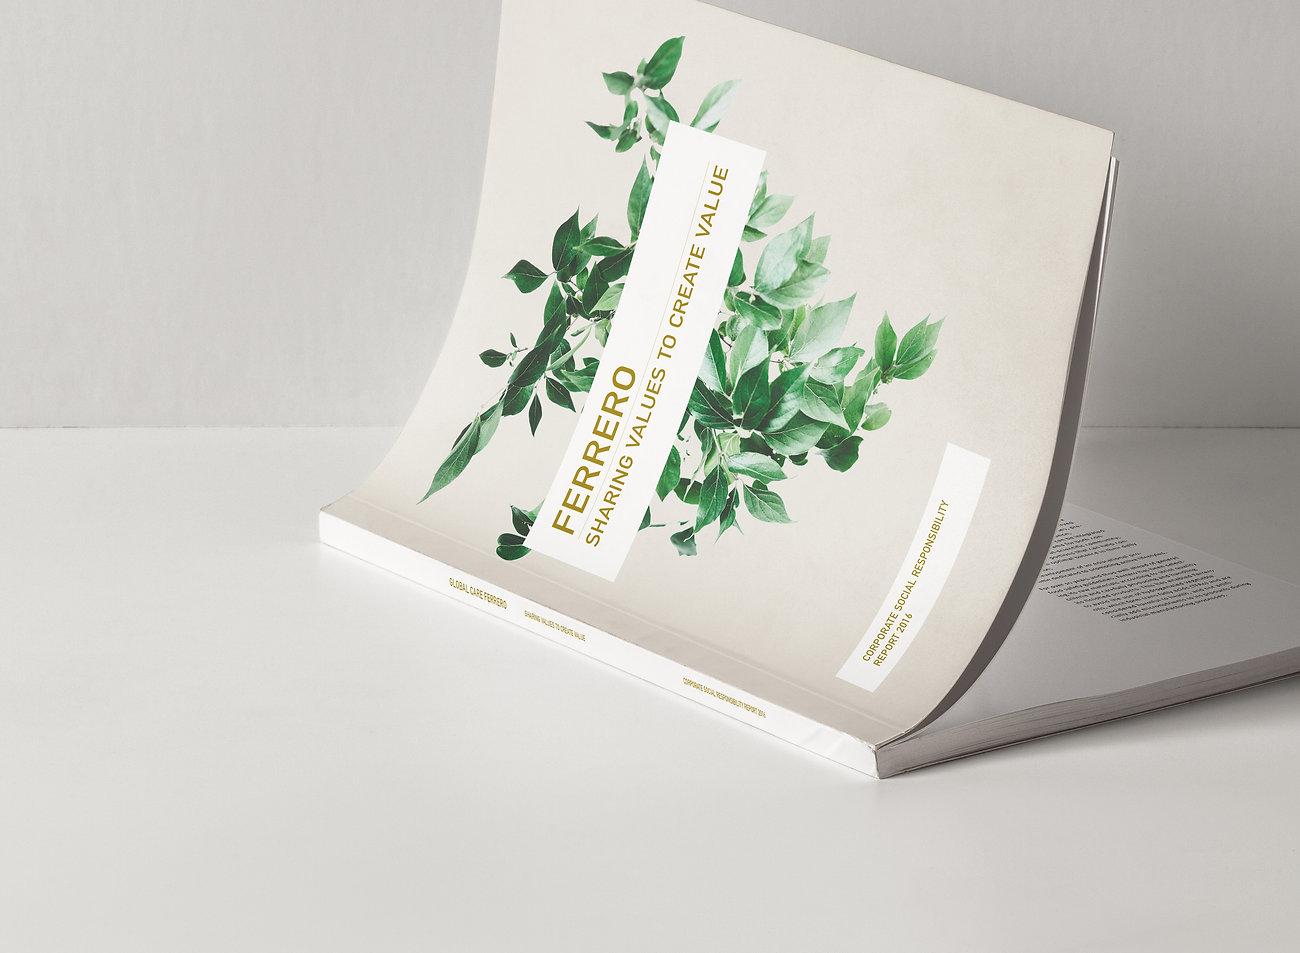 Cover-Magazine-Presentation-Mockup crop.